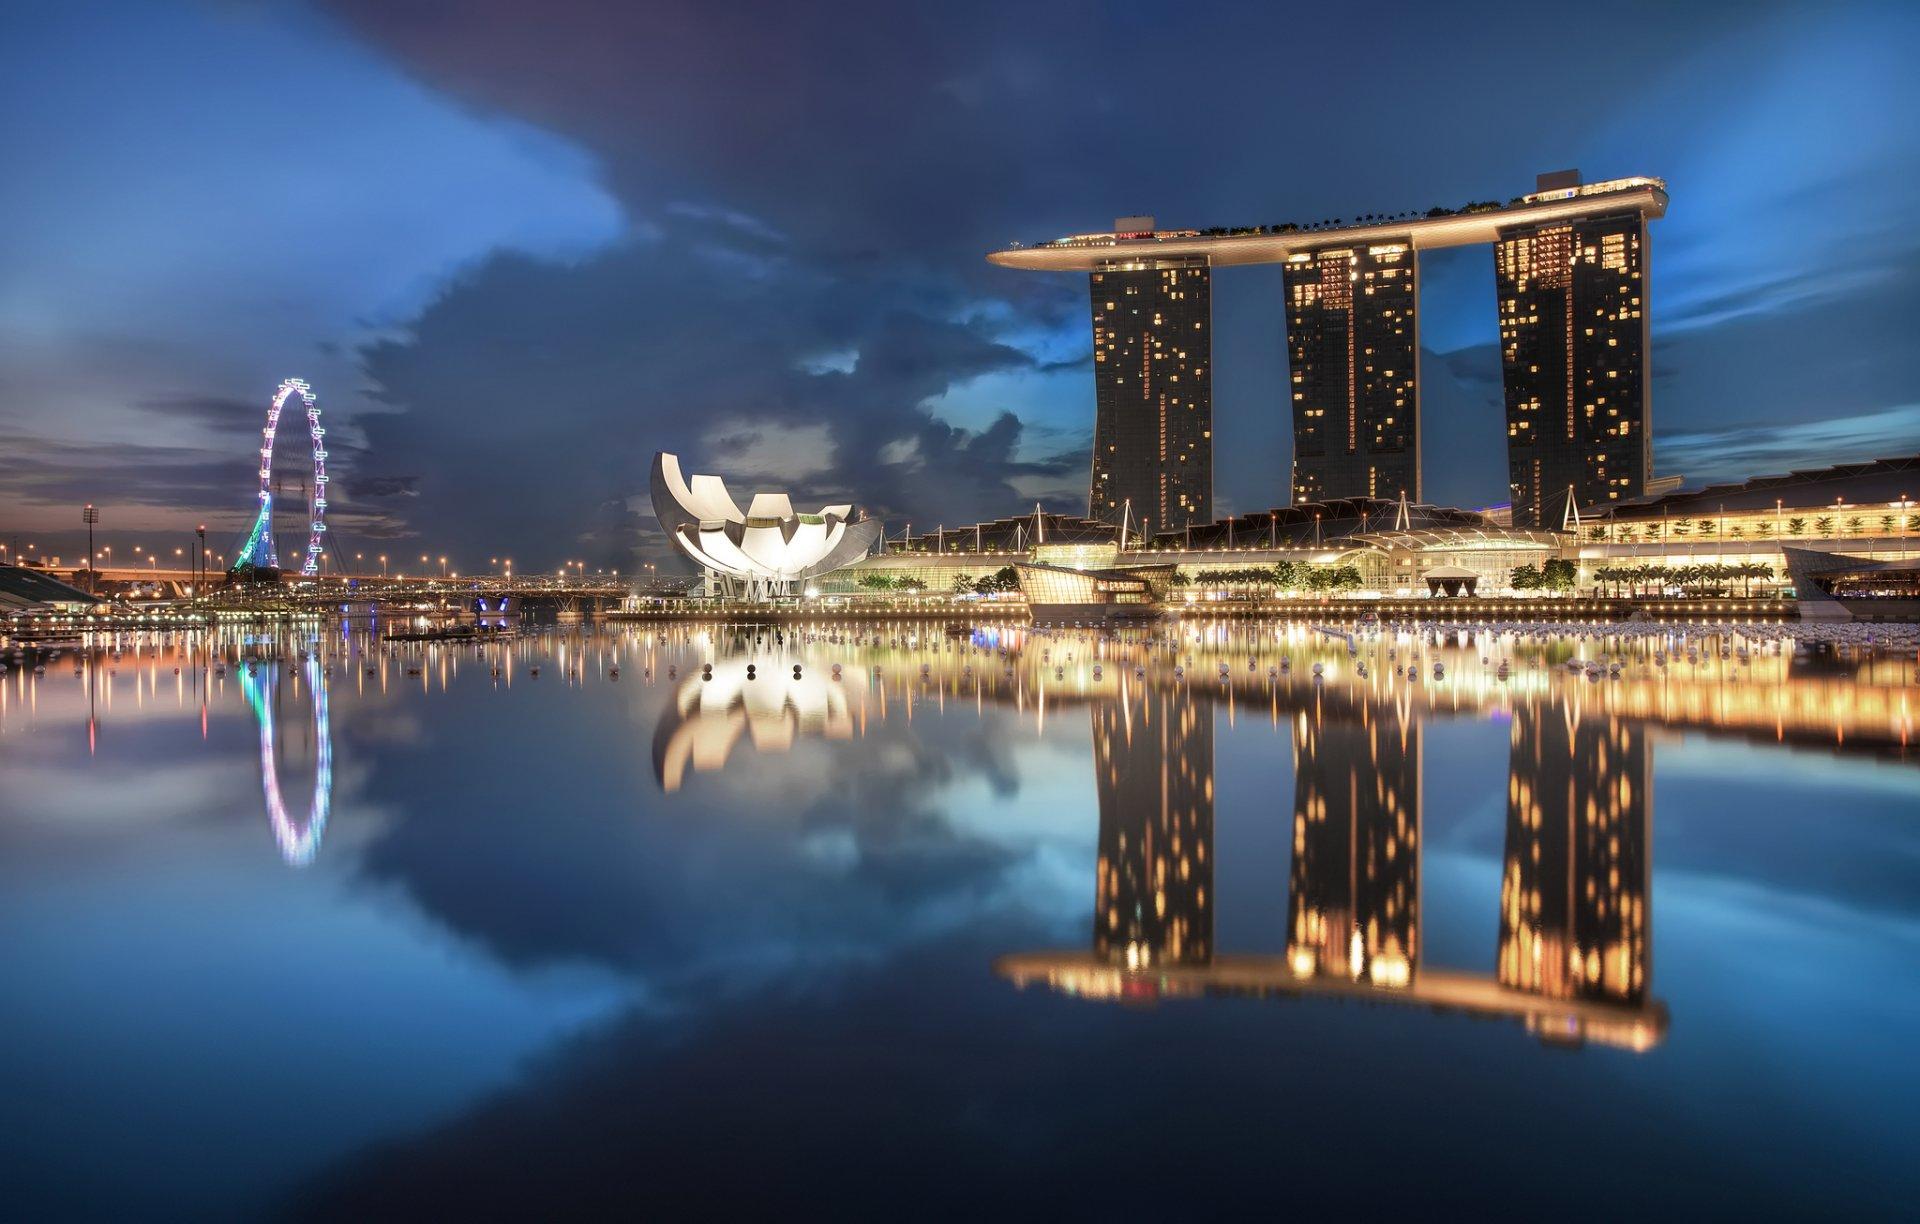 страны архитектура Сингапур ночь  № 1475998 бесплатно